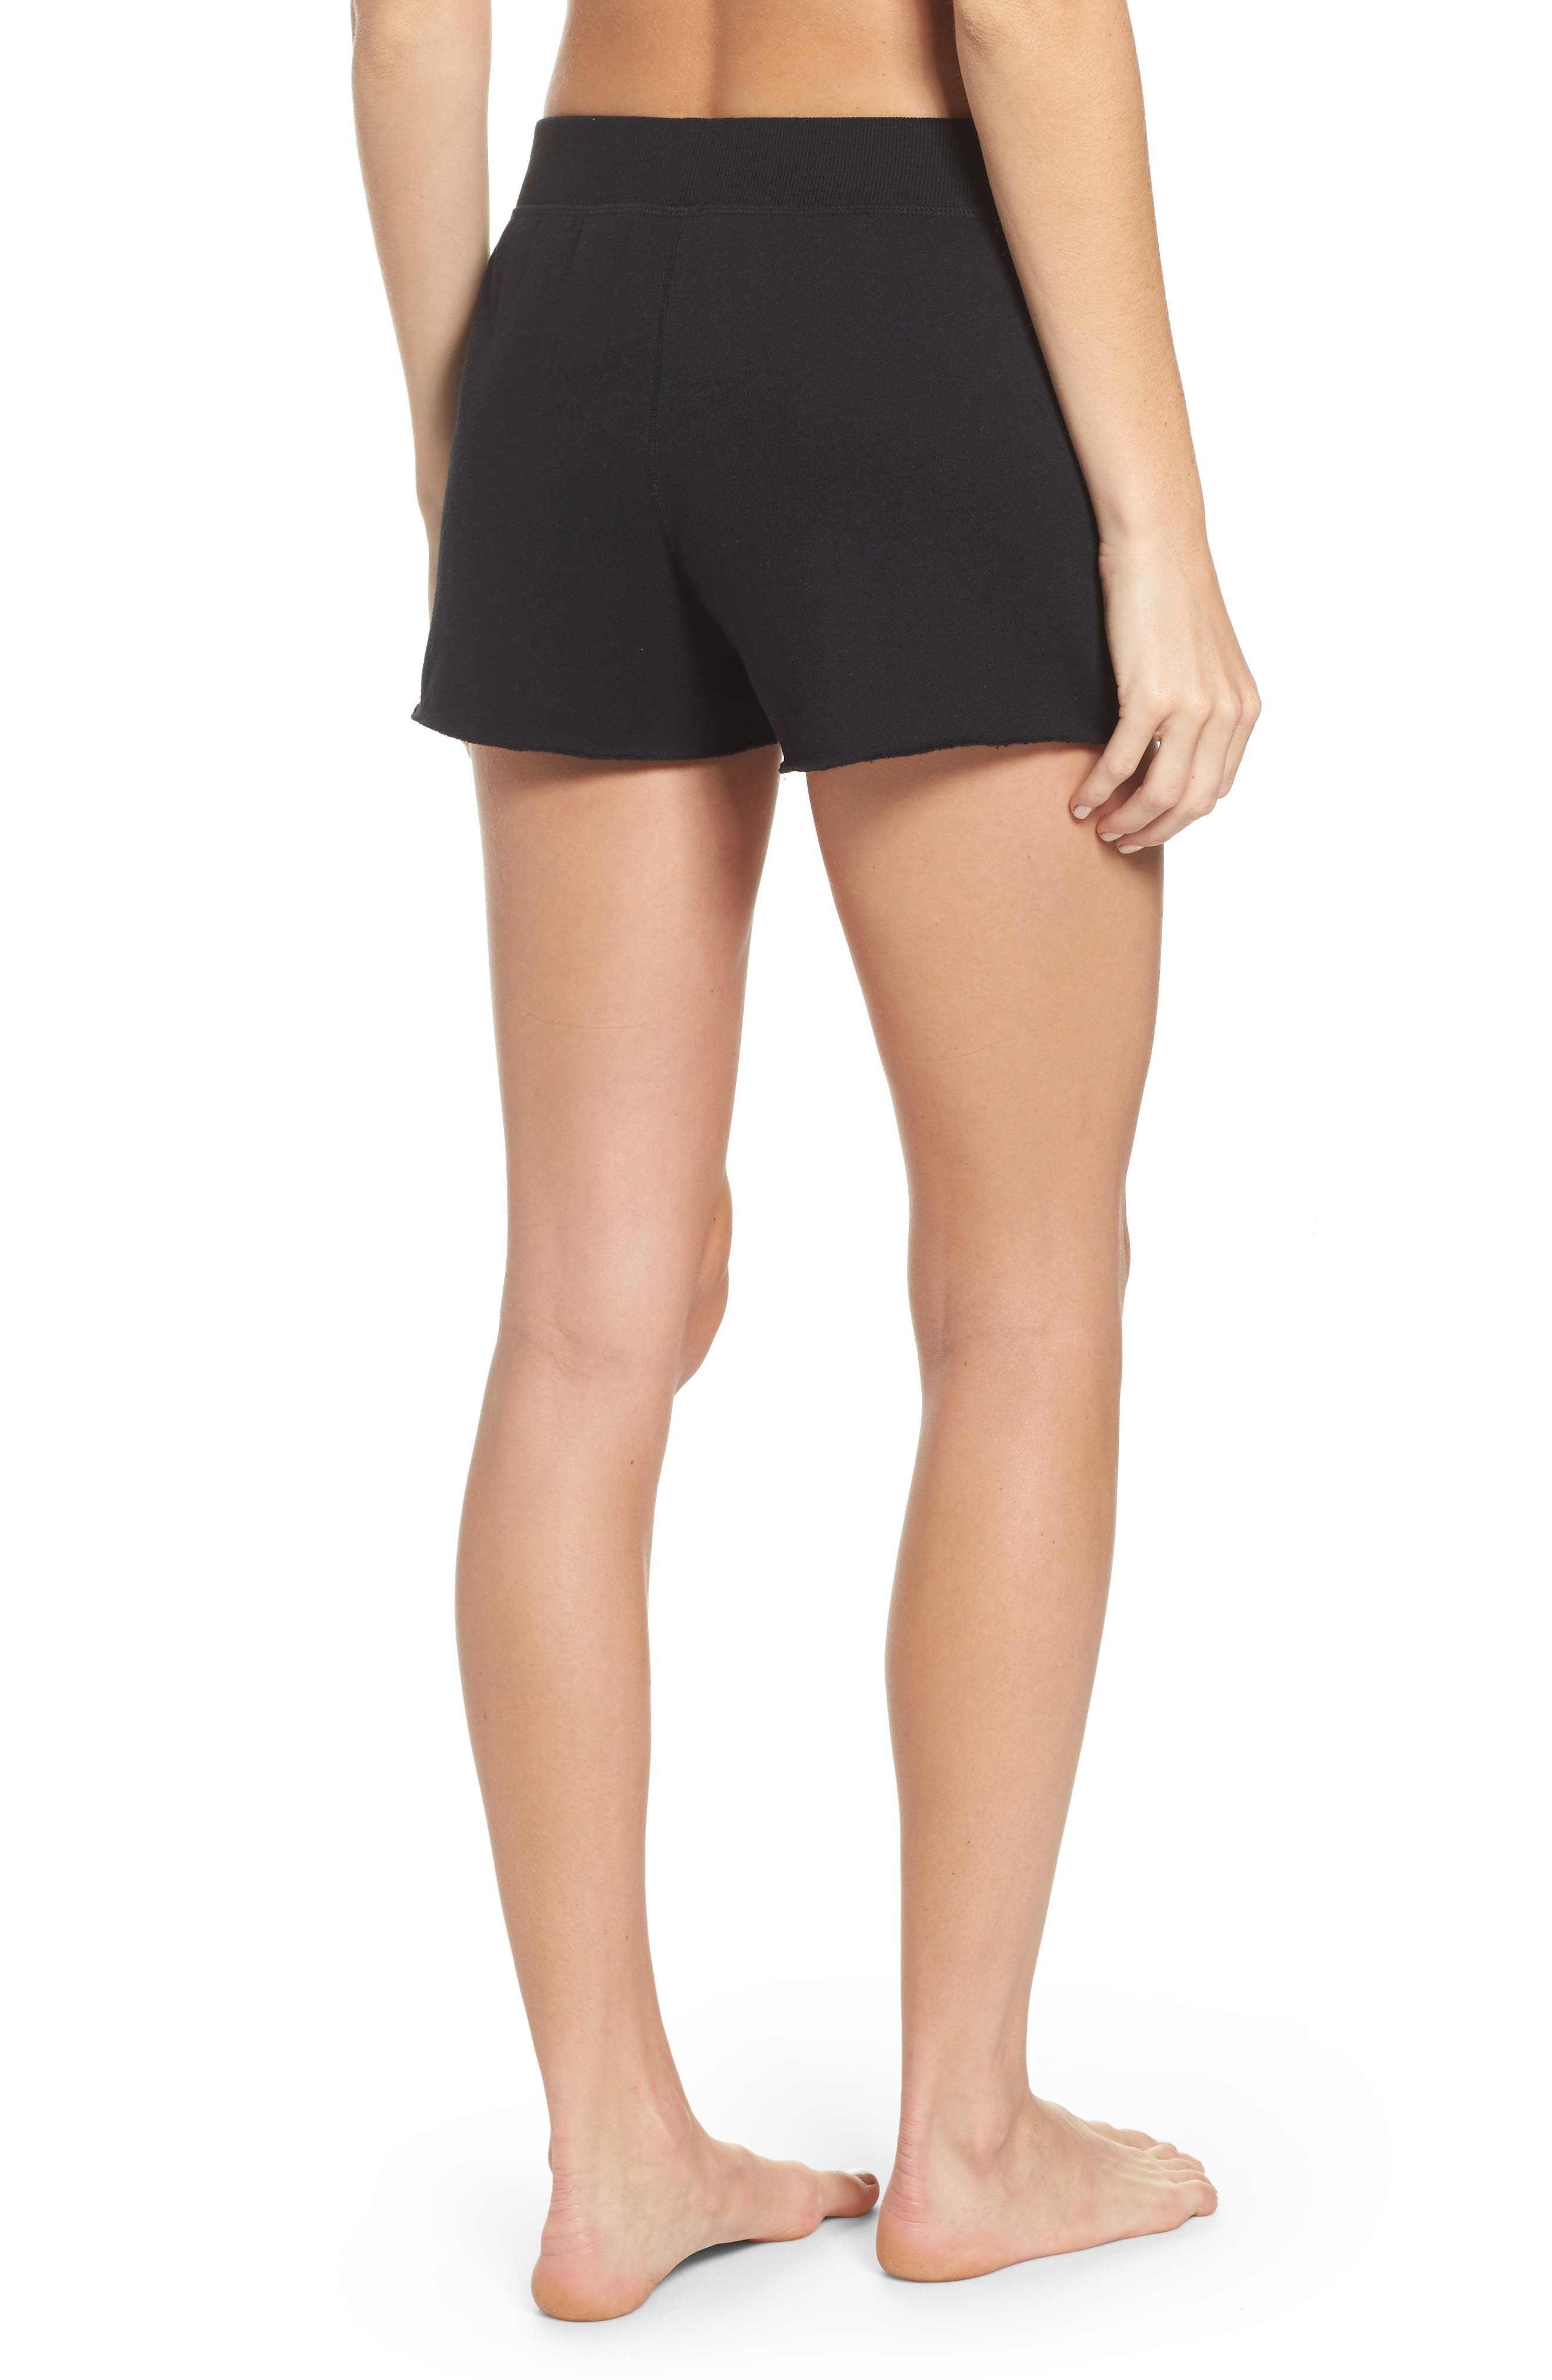 Slay Shorts,                             Alternate thumbnail 2, color,                             Black